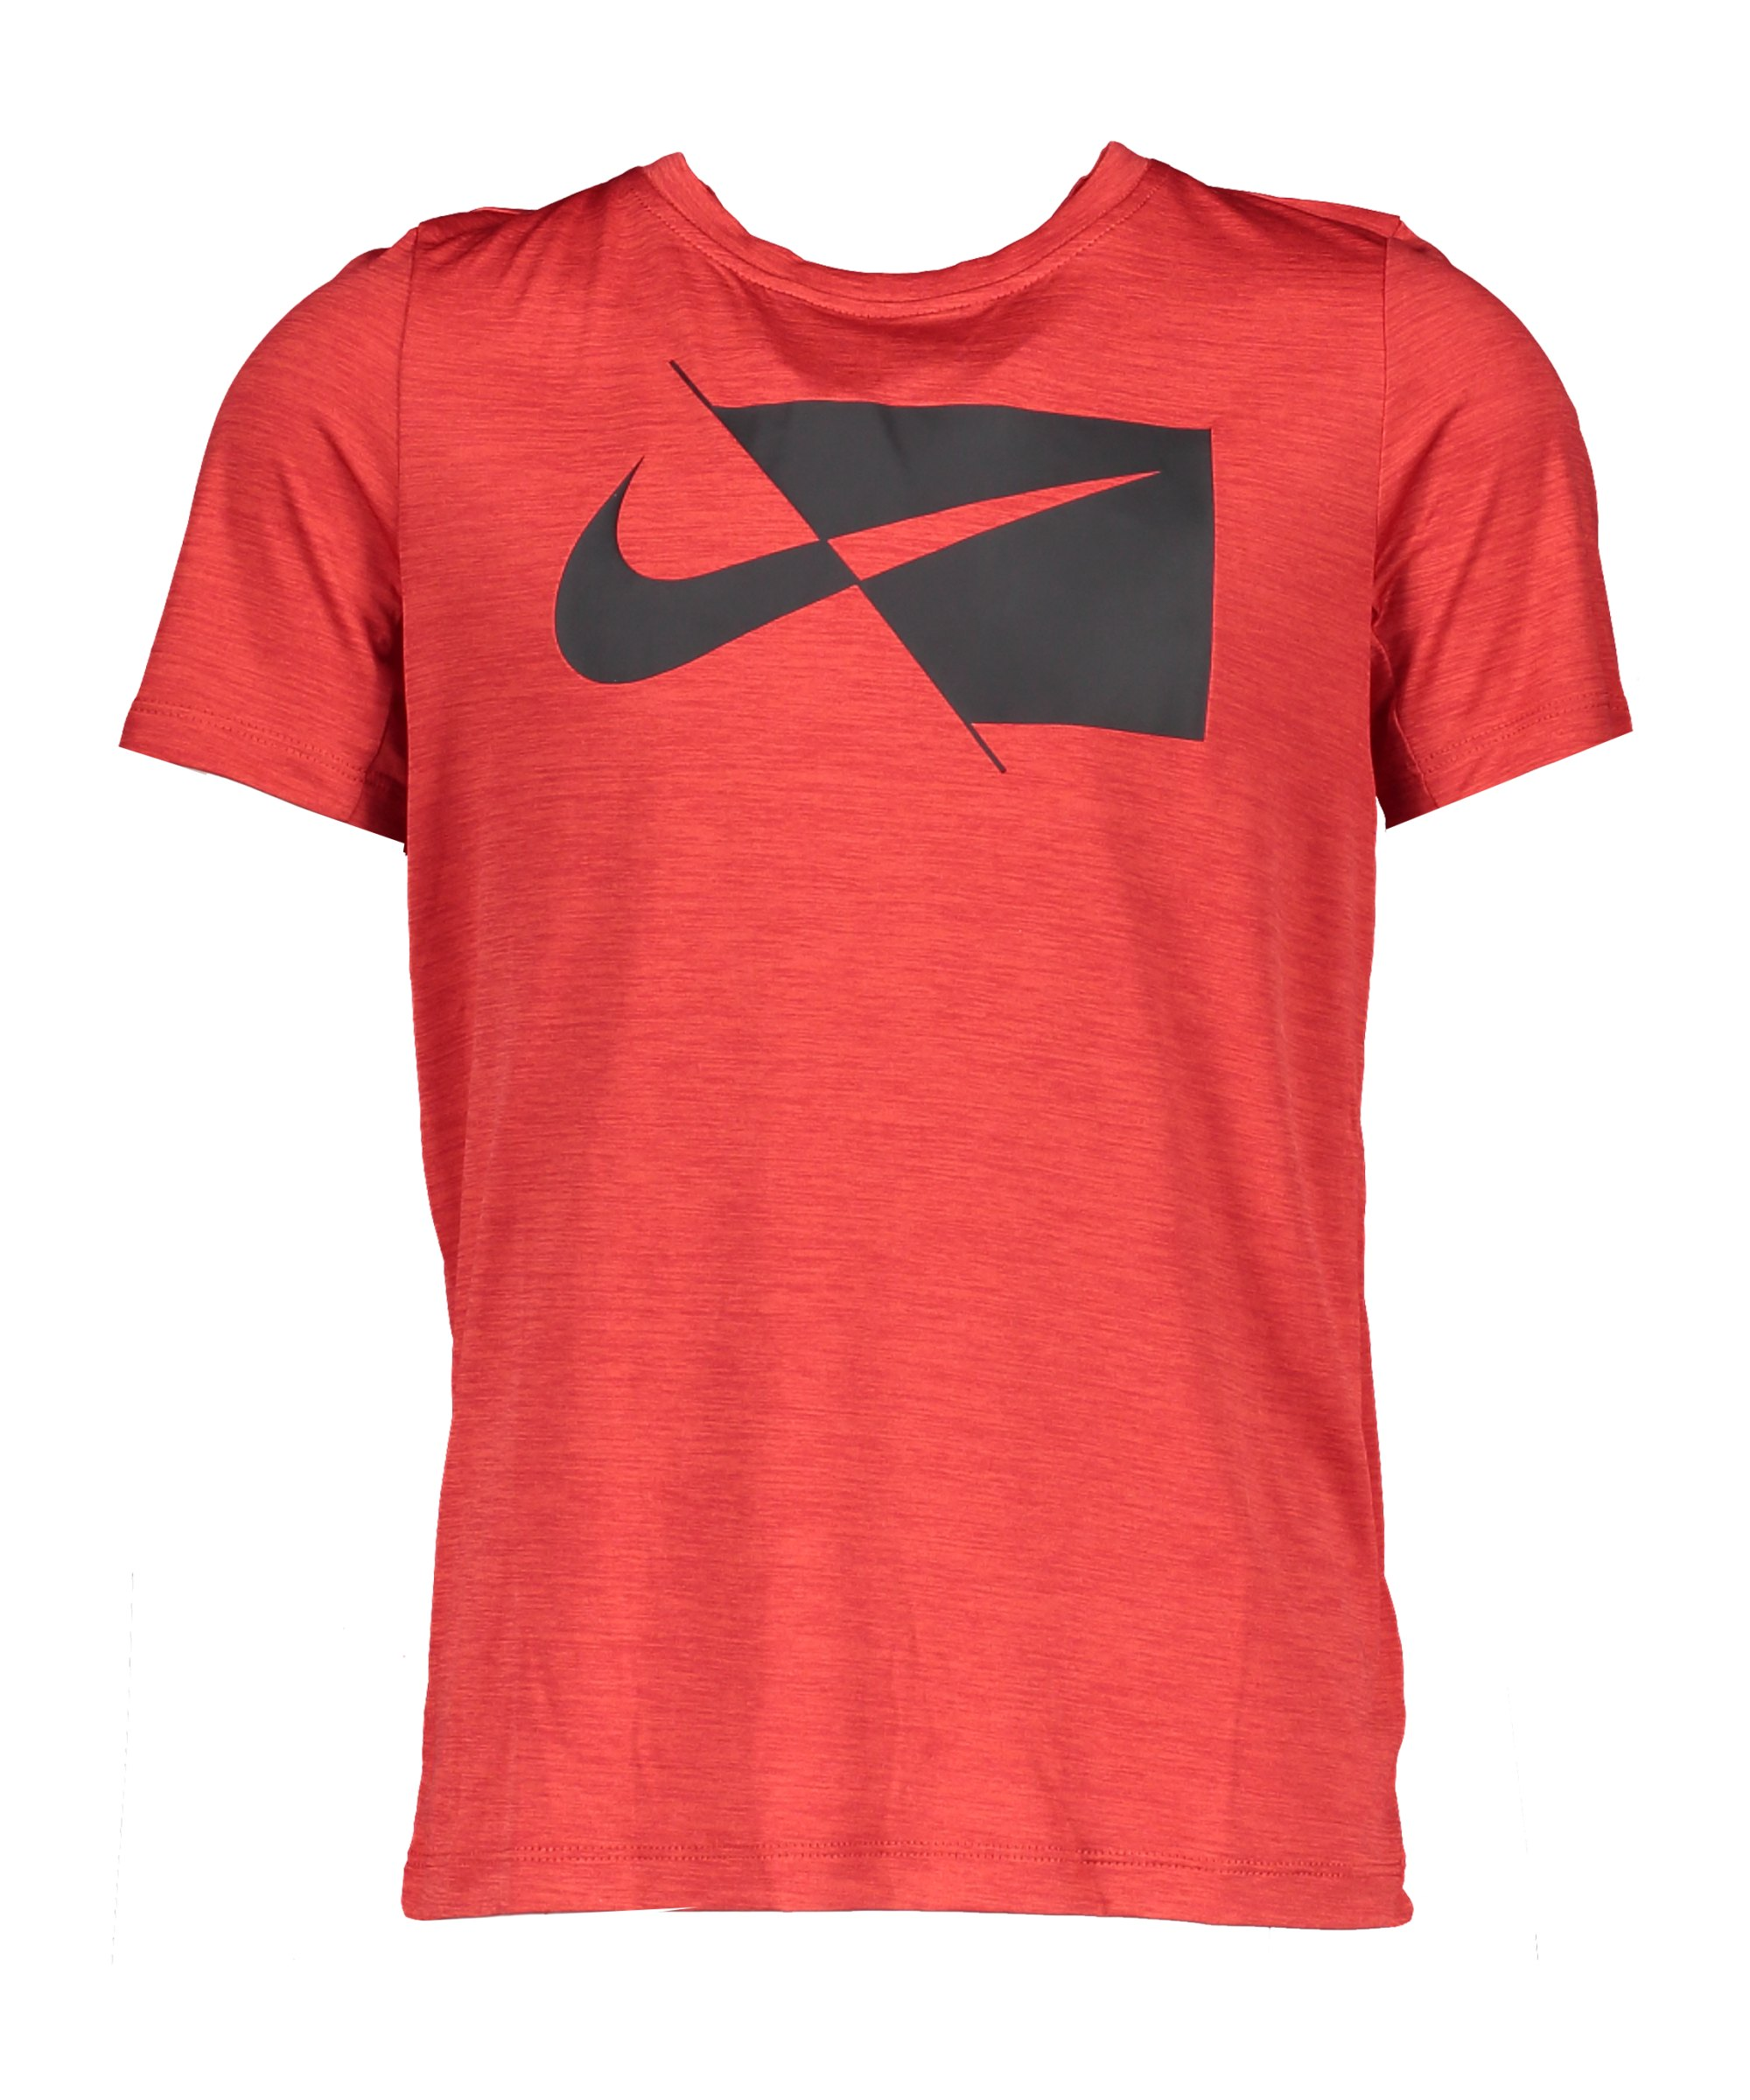 Nike HBR T-Shirt Kids Rot Schwarz F657 - rot